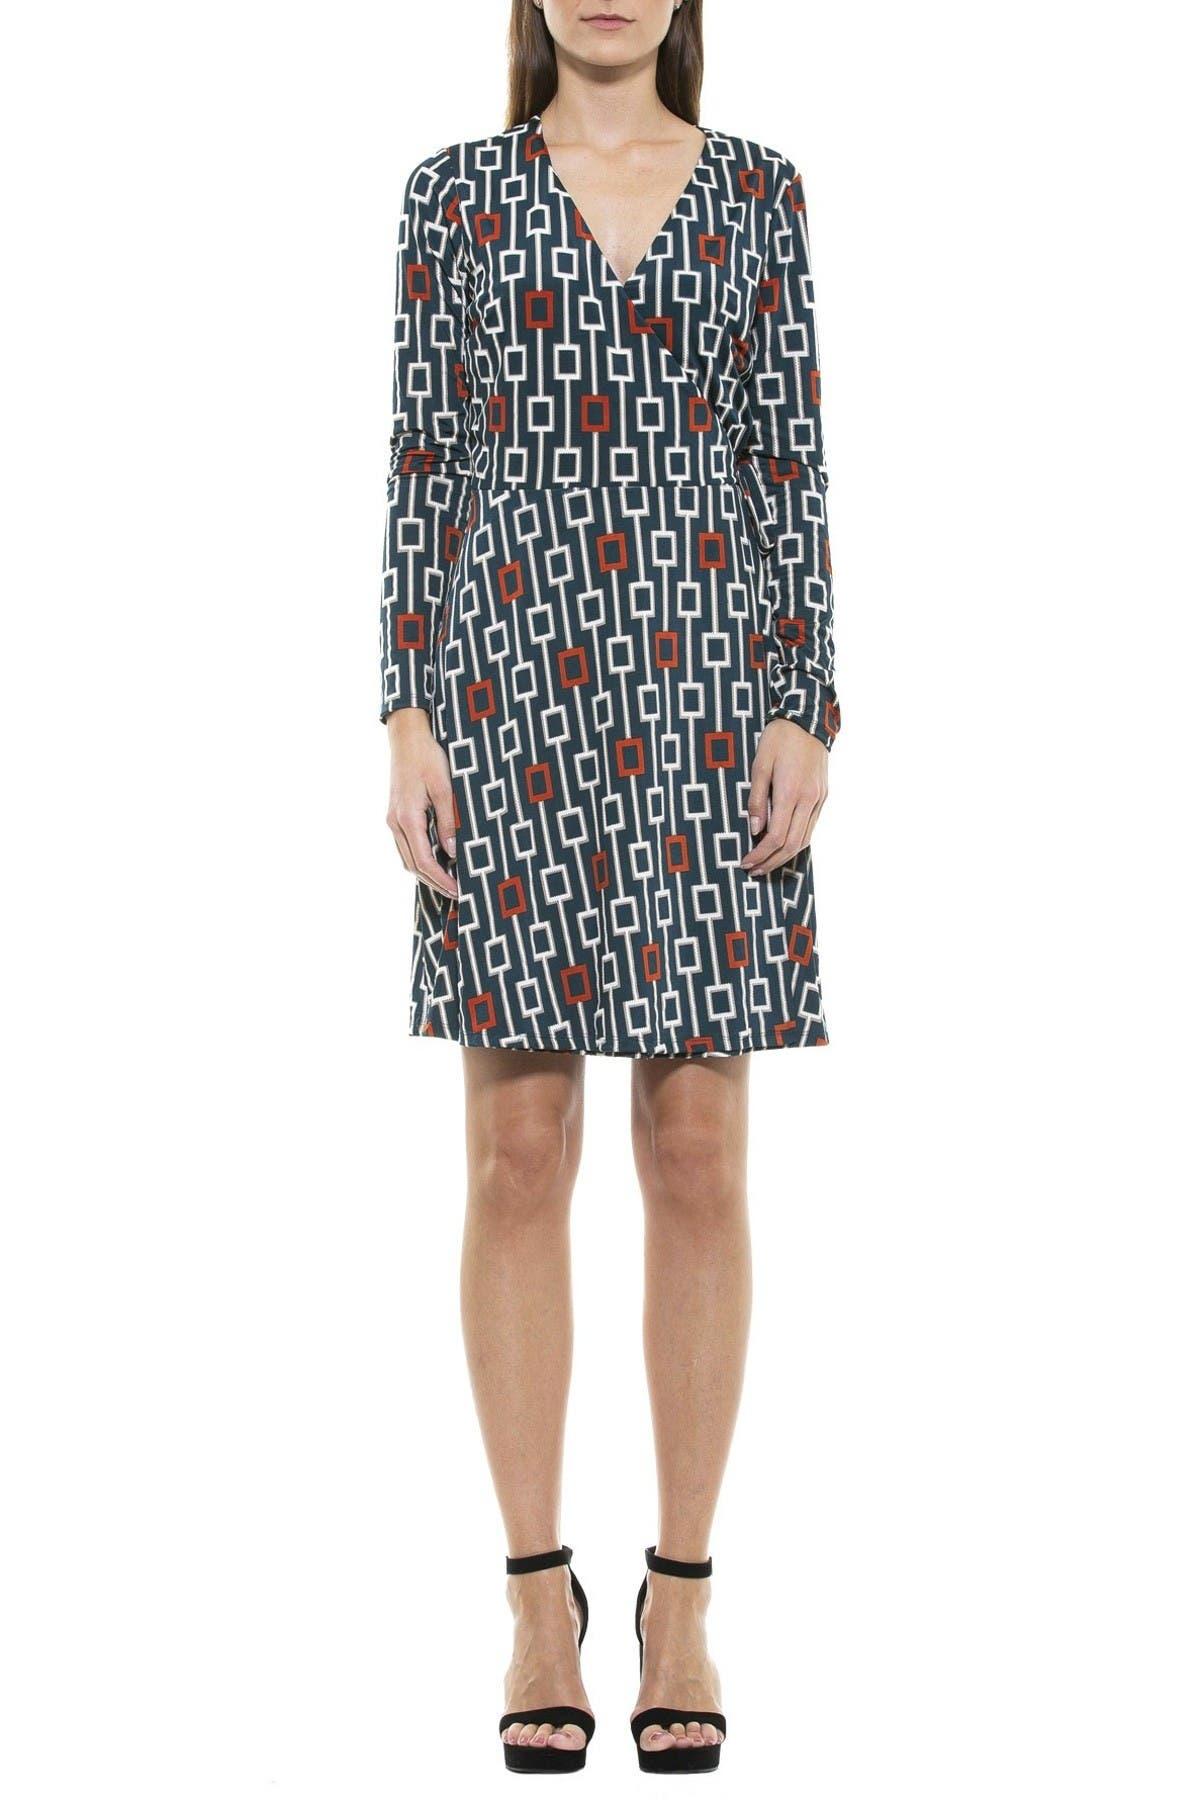 Image of Alexia Admor Geo Printed Wrap Dress